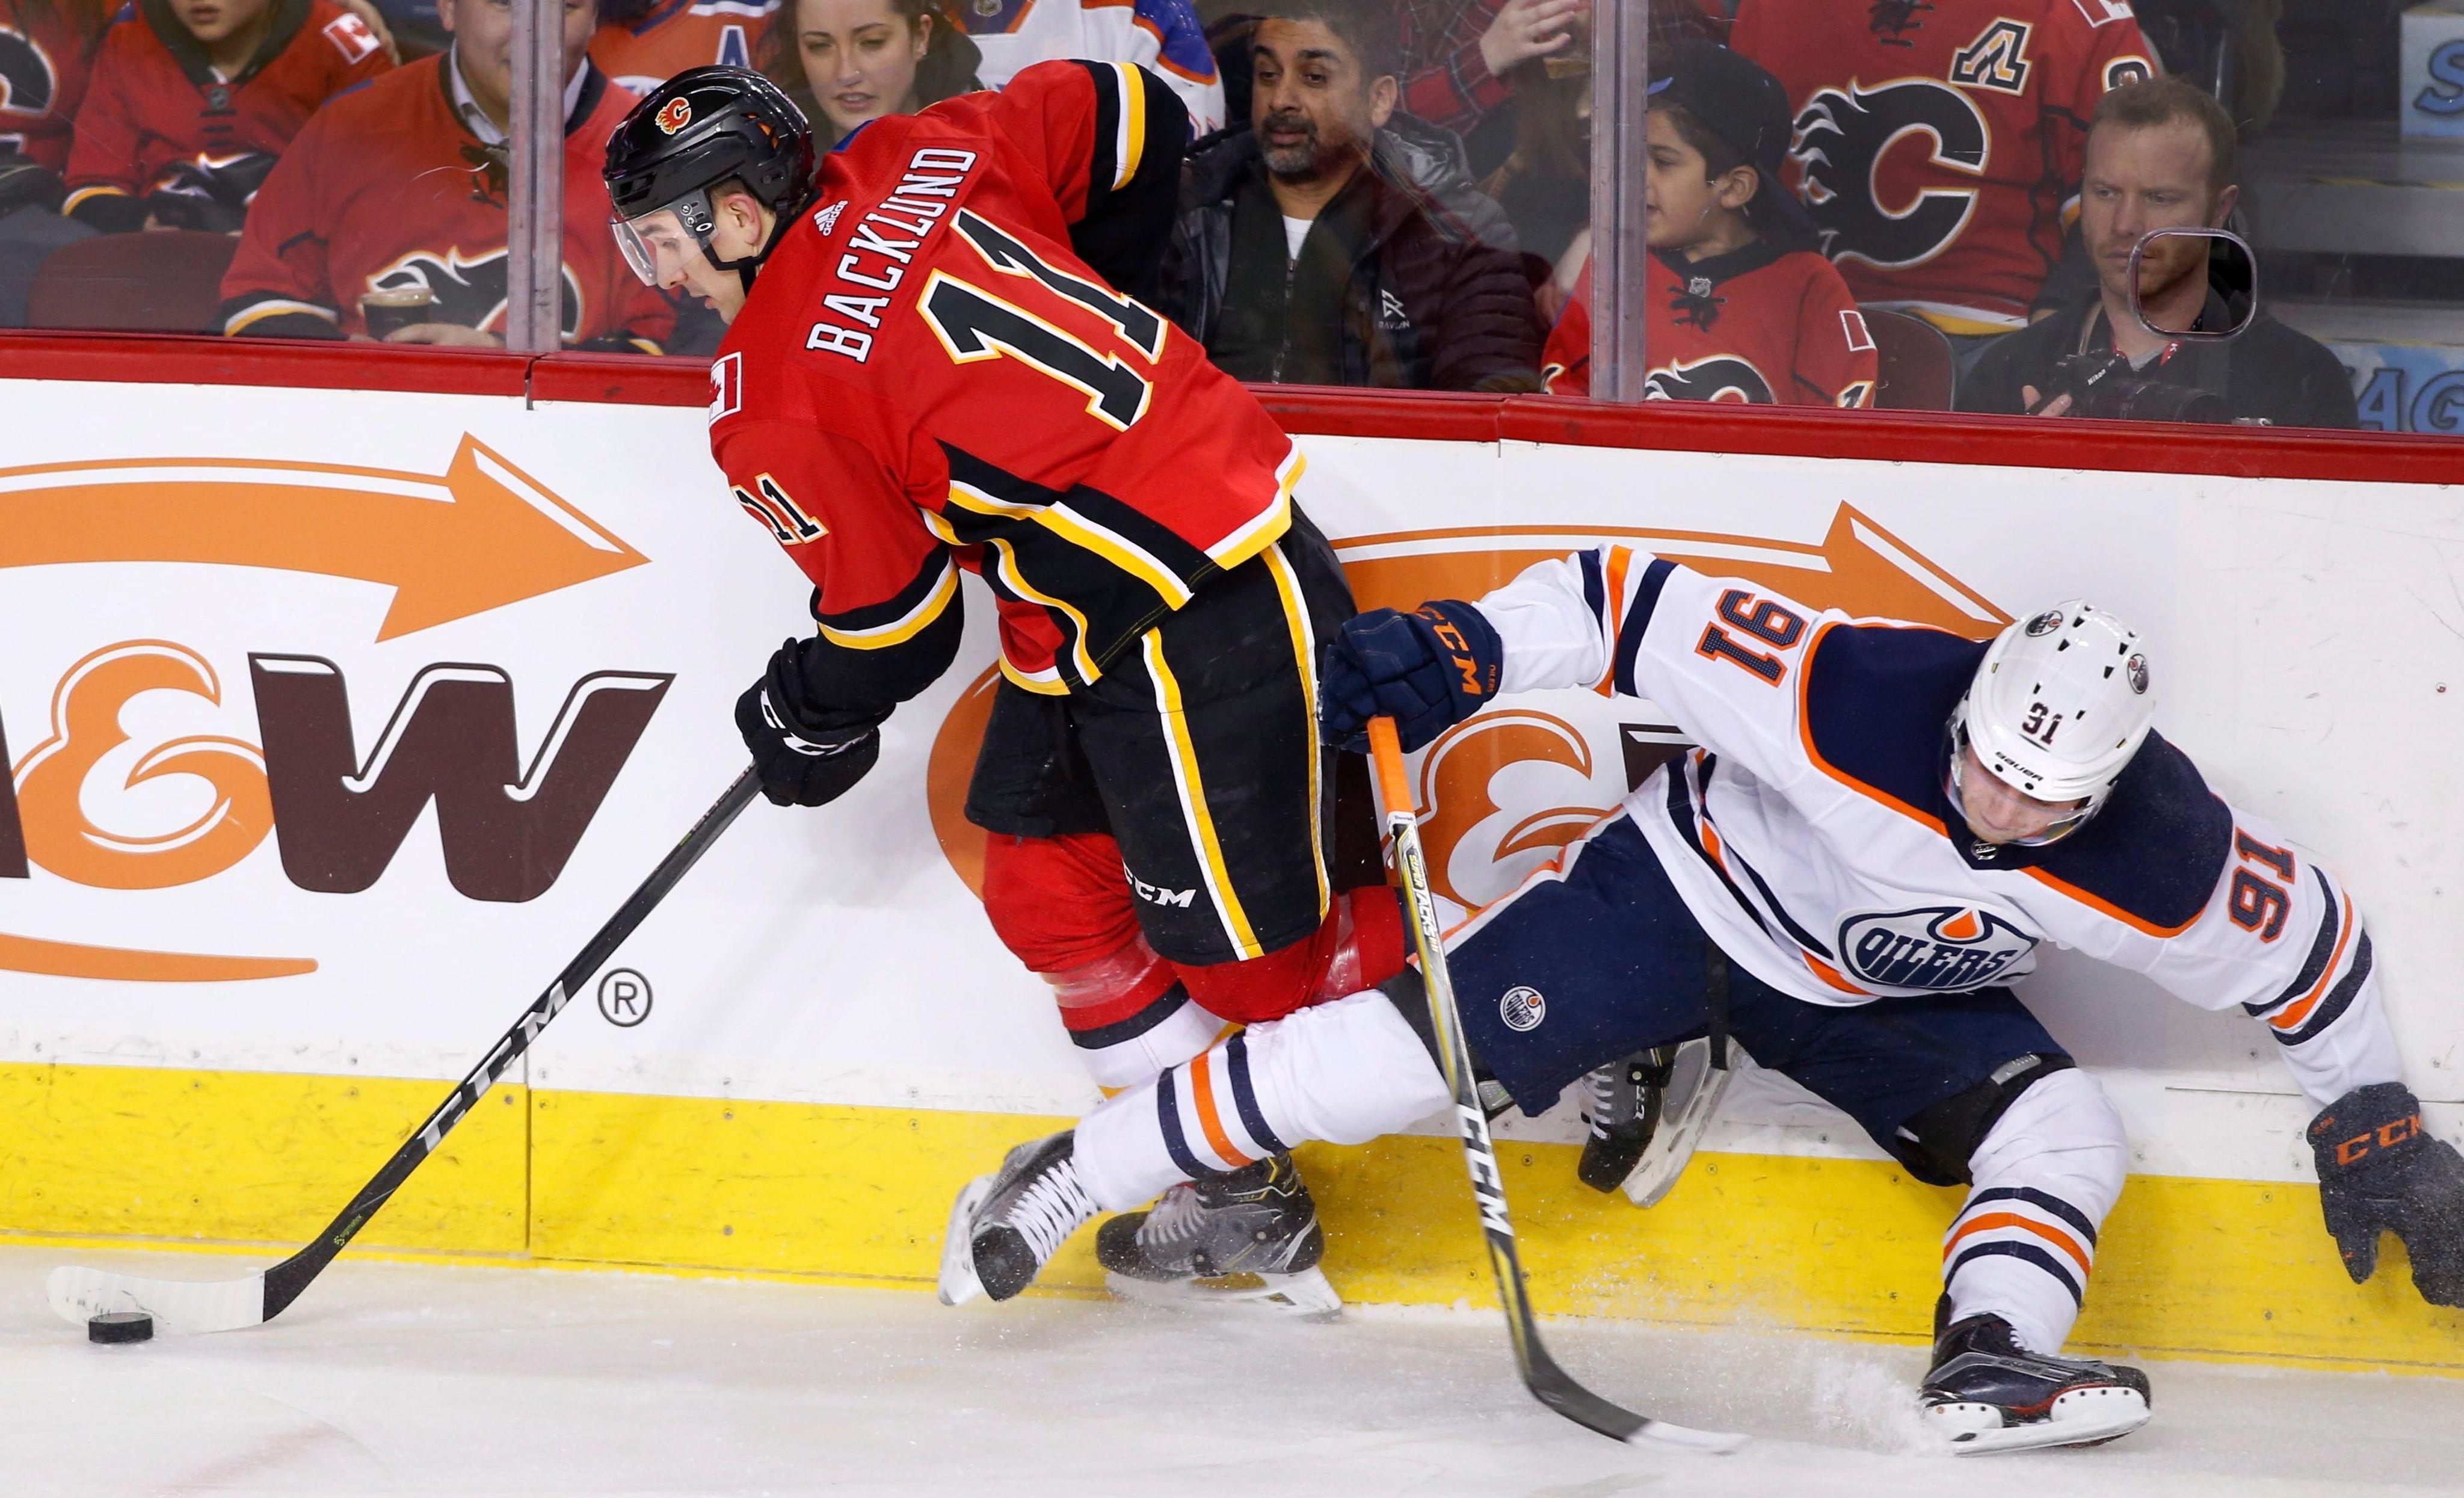 Oilers_flames_hockey_17195_s4096x2490